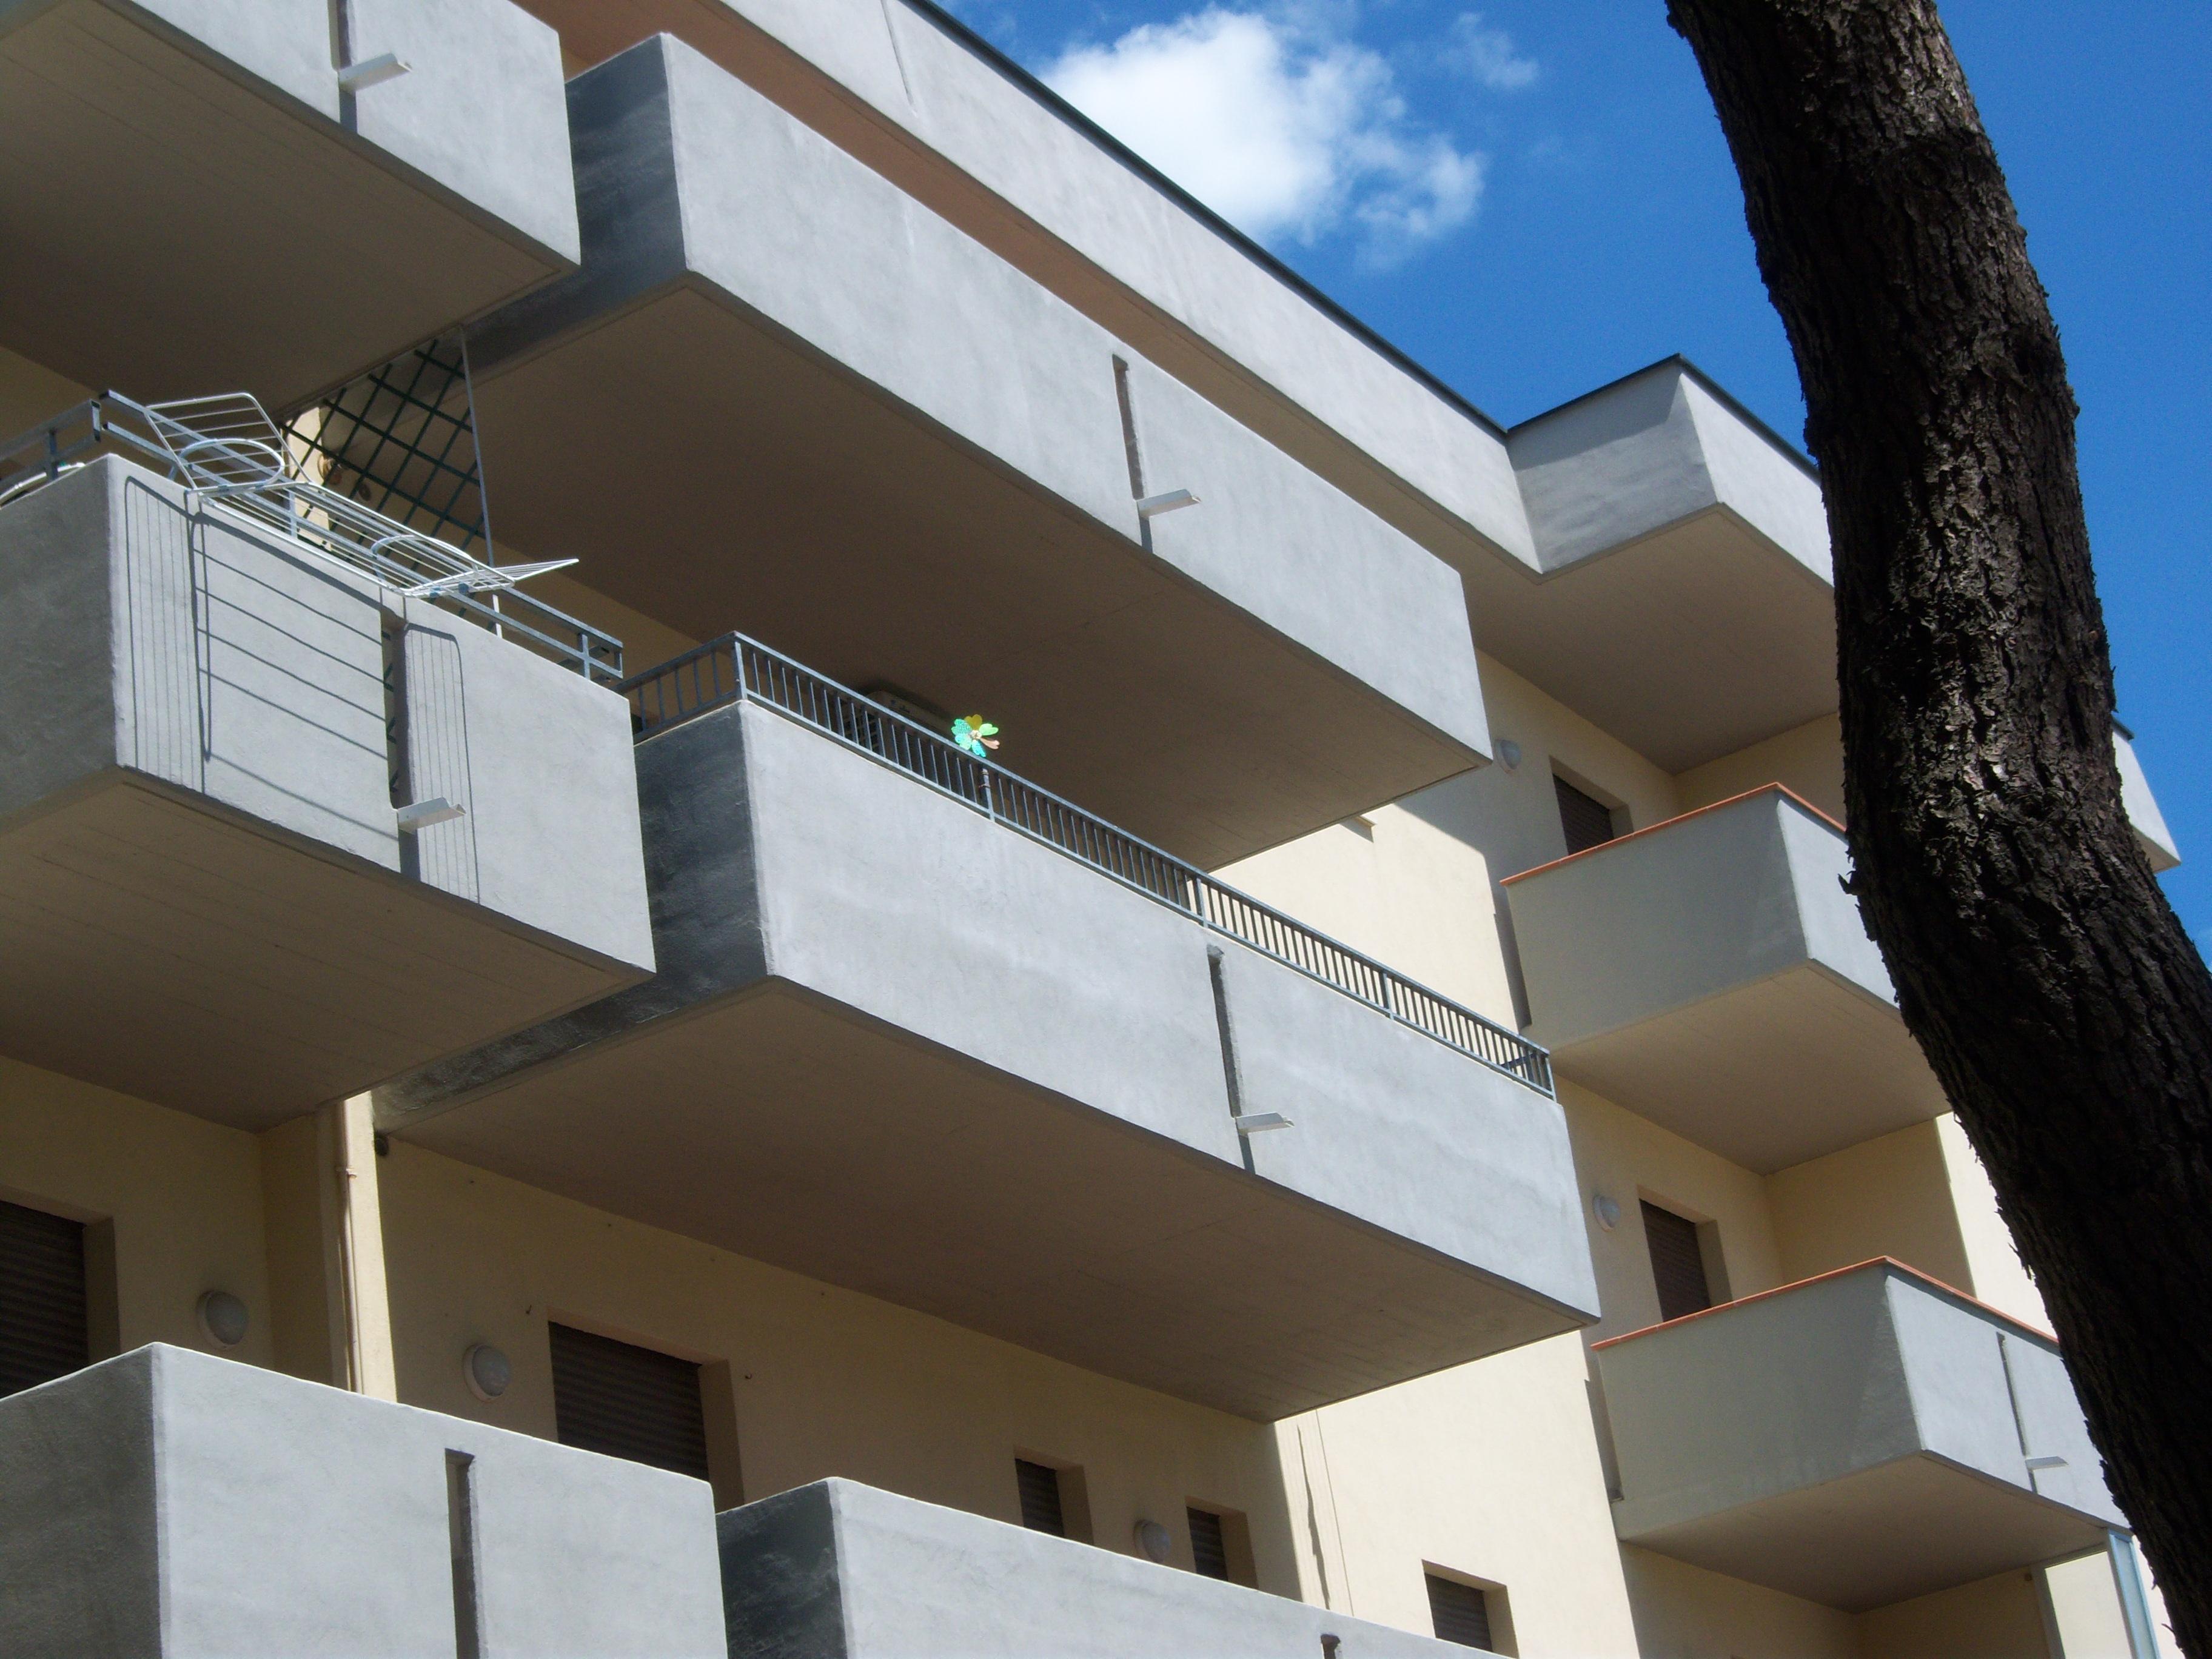 For sale 2 bedrooms lido adriano ravenna italy - Bagno marina beach lido adriano ...